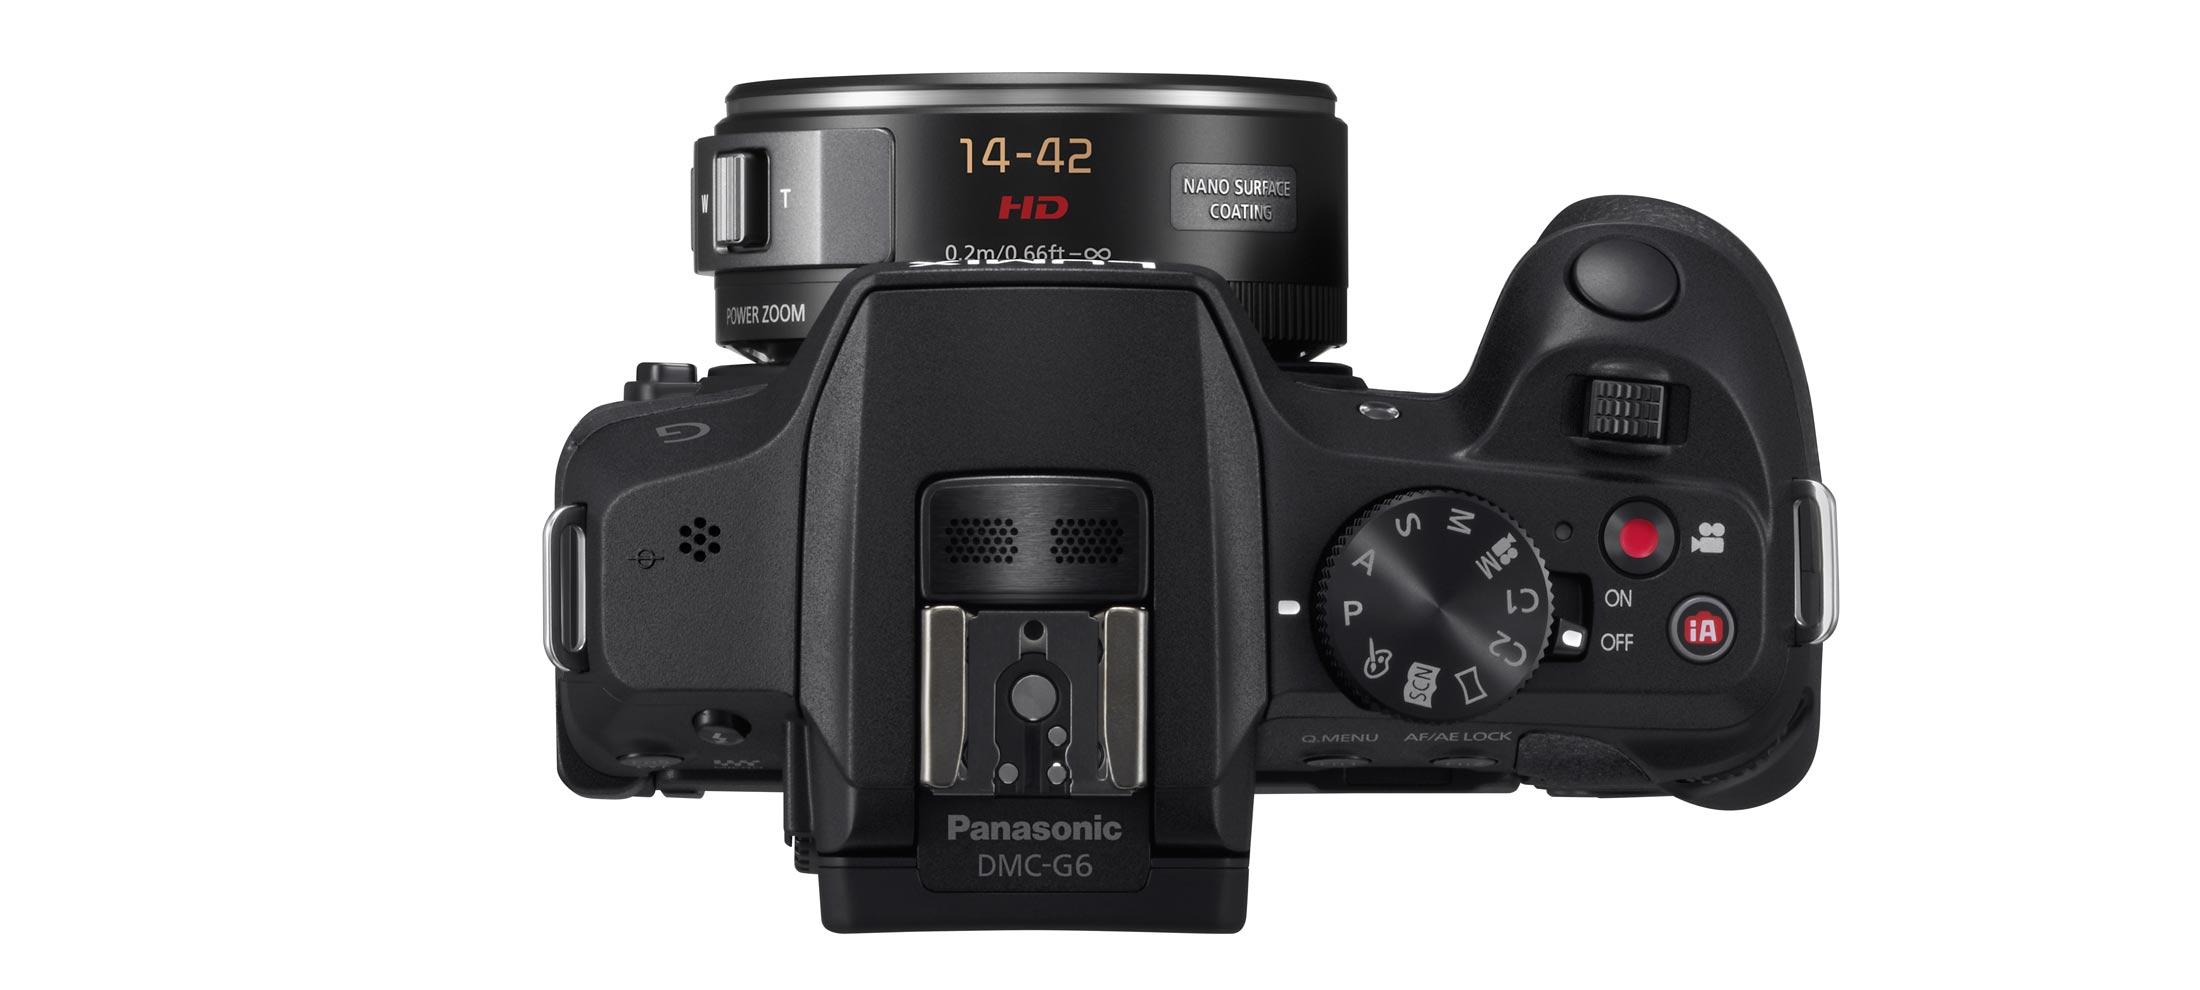 kompaktkamera bridgekamera spiegelreflex oder systemkamera. Black Bedroom Furniture Sets. Home Design Ideas